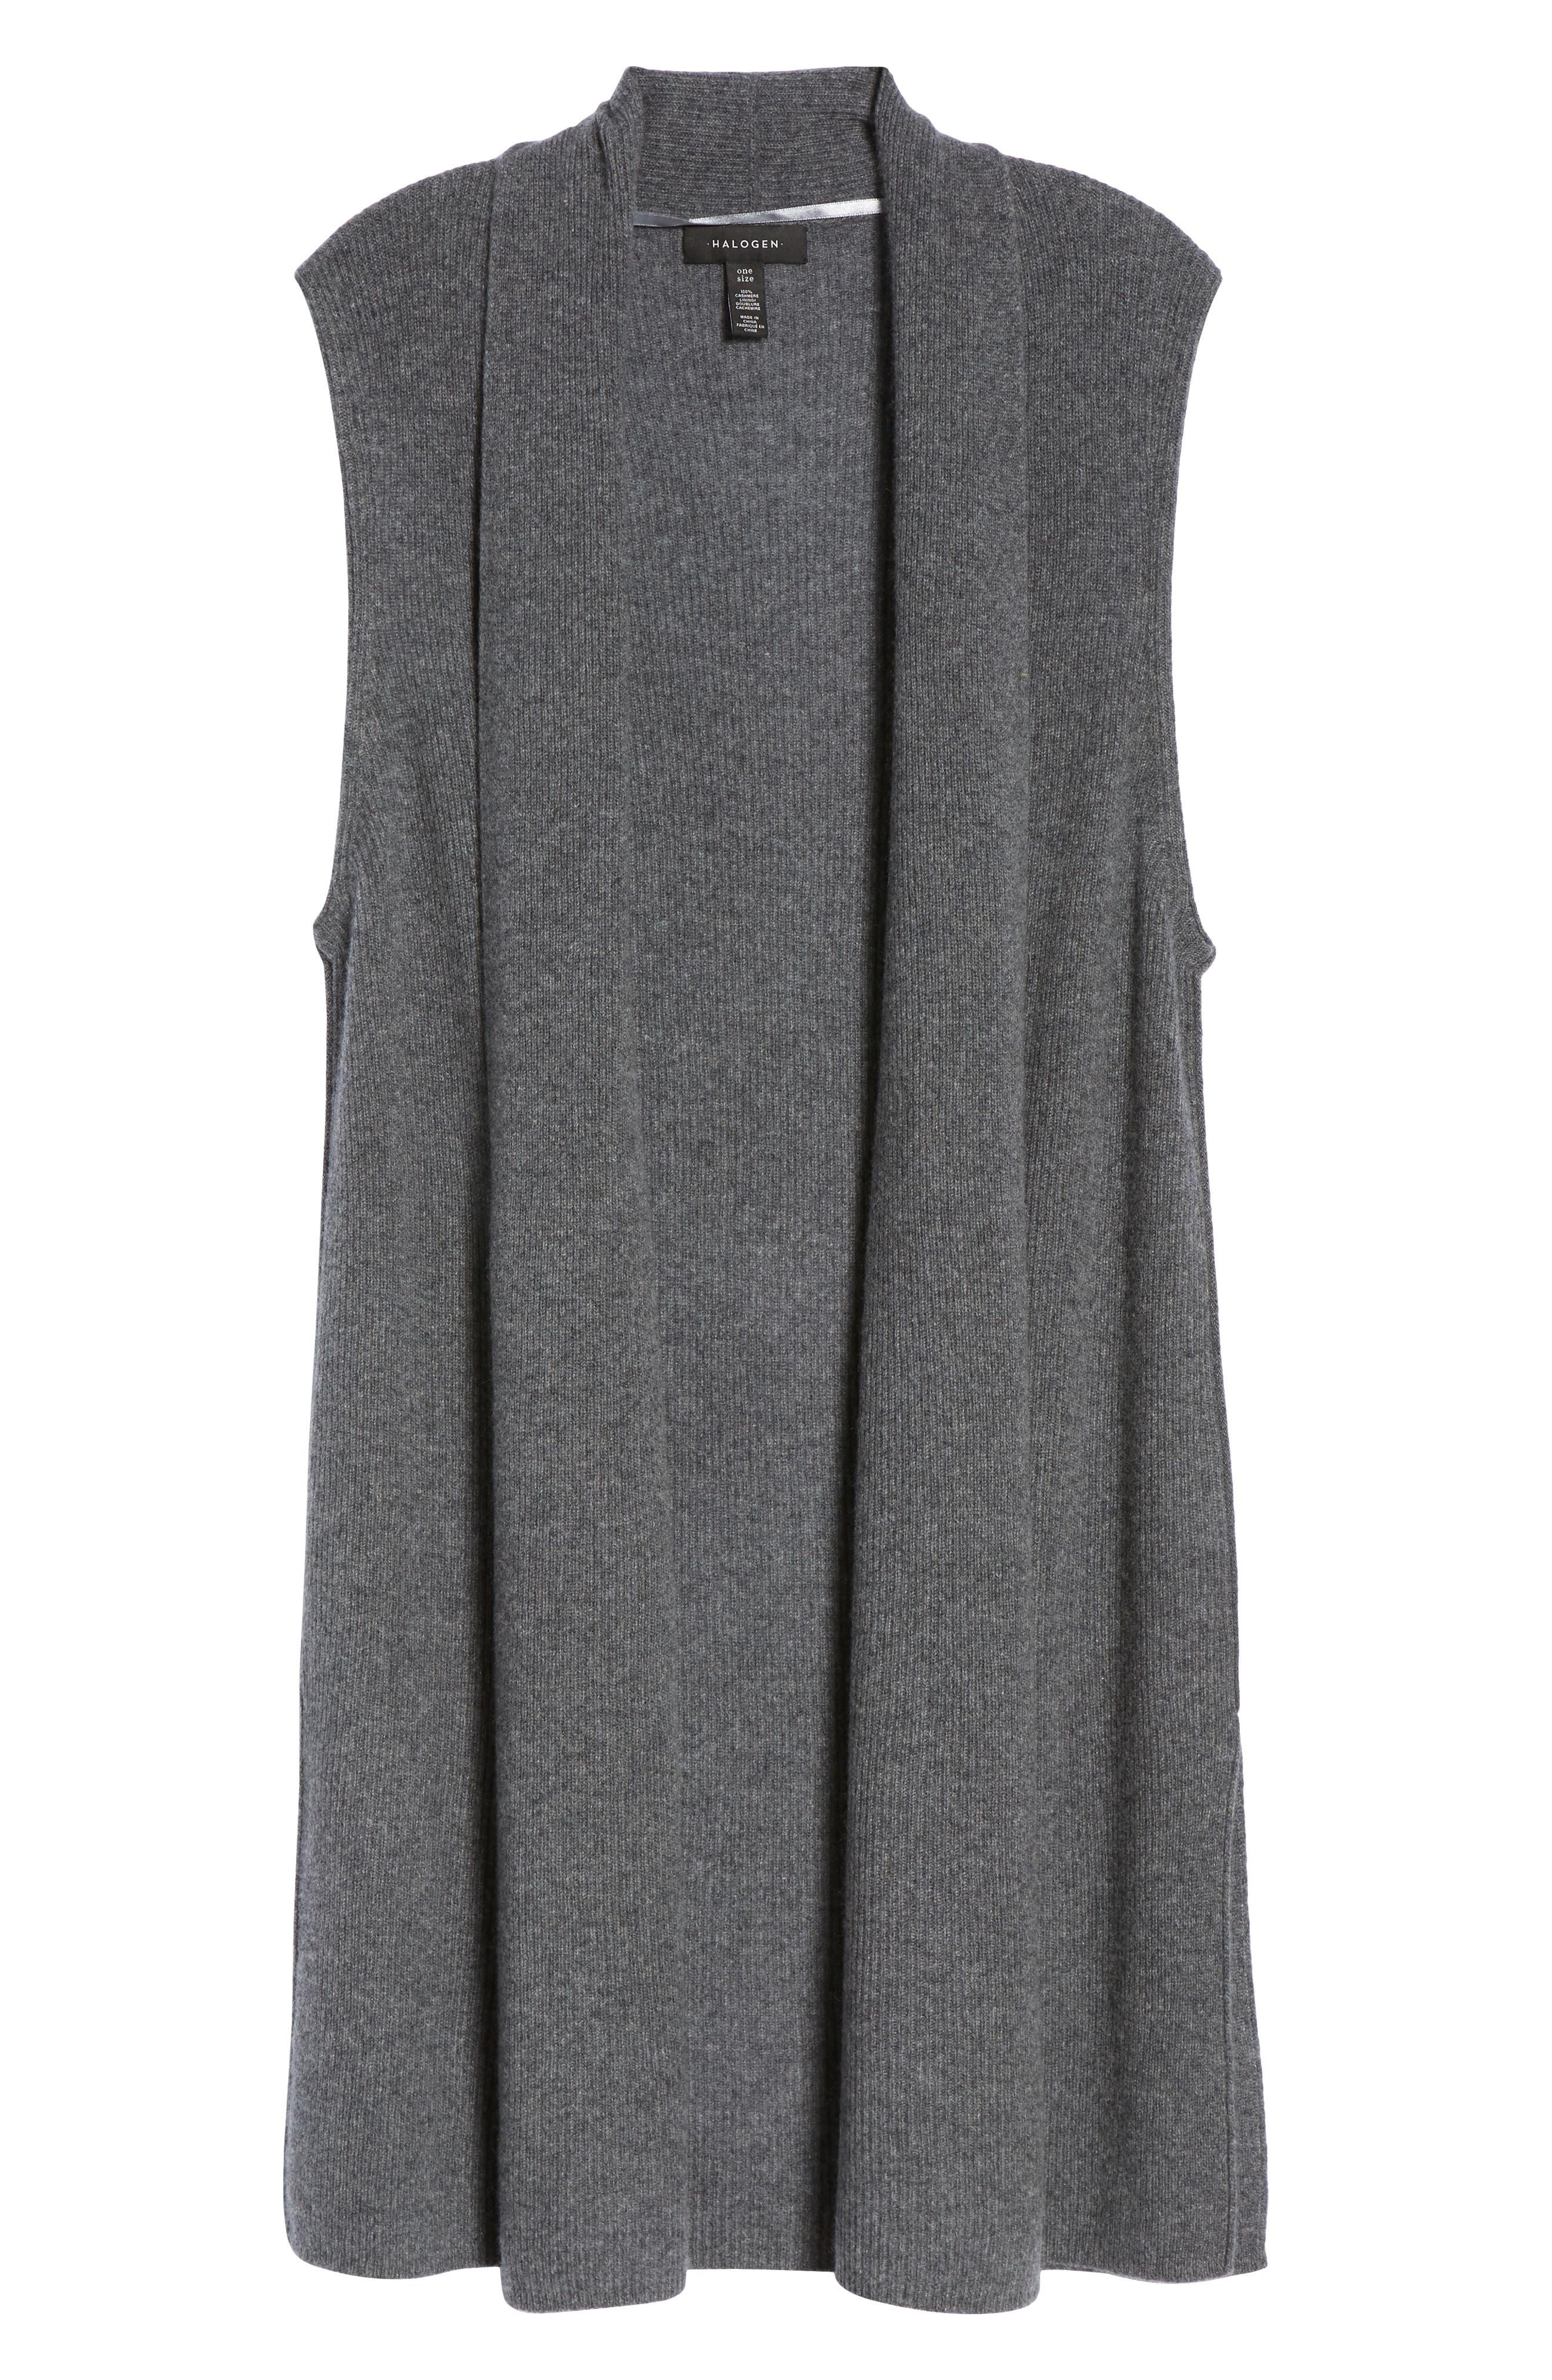 Ribbed Cashmere Vest,                             Alternate thumbnail 6, color,                             Grey Dark Heather